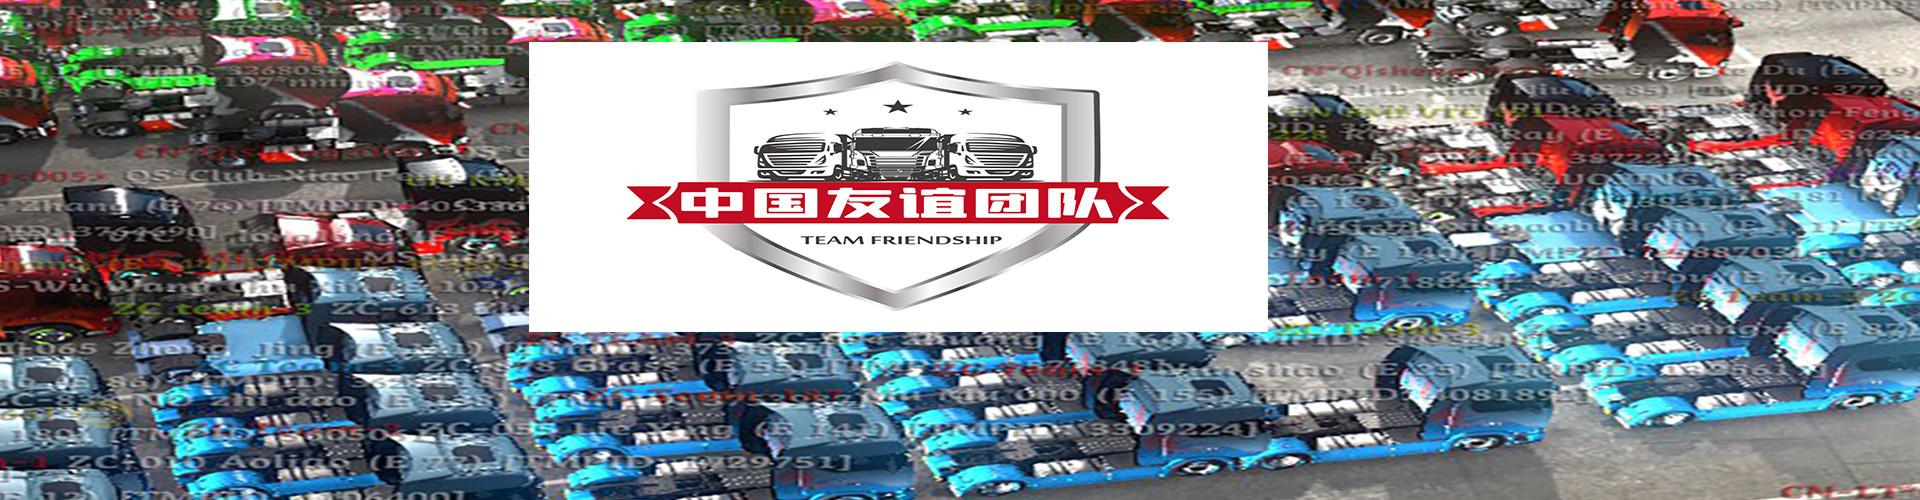 CHN Friendship Team 15th Activity